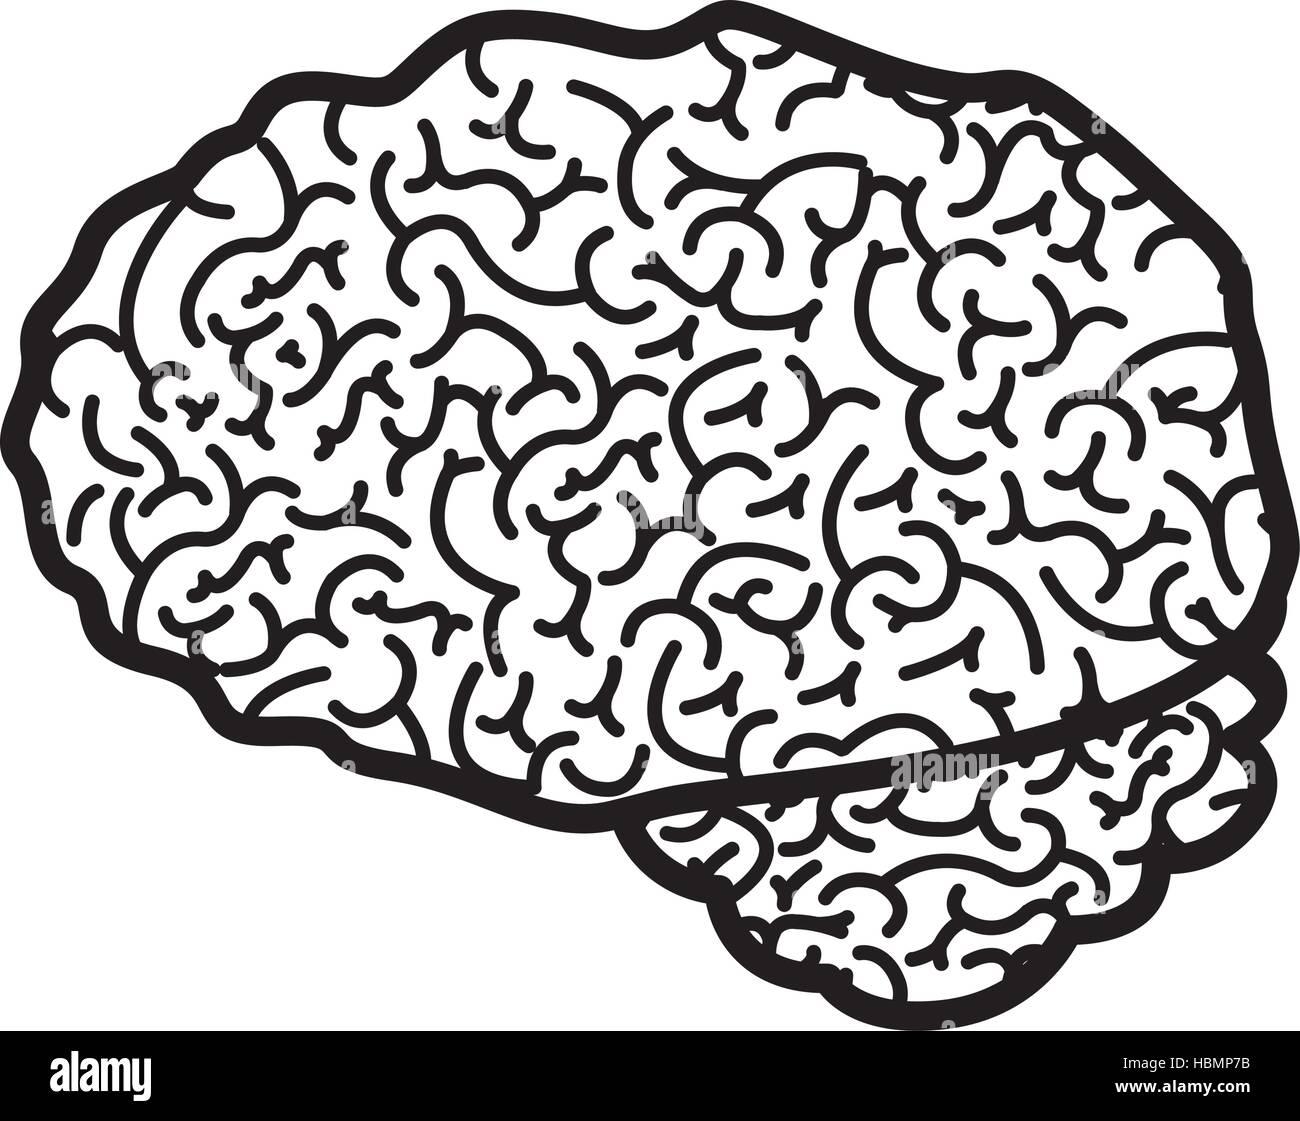 Brain Lobes Stockfotos & Brain Lobes Bilder - Seite 3 - Alamy